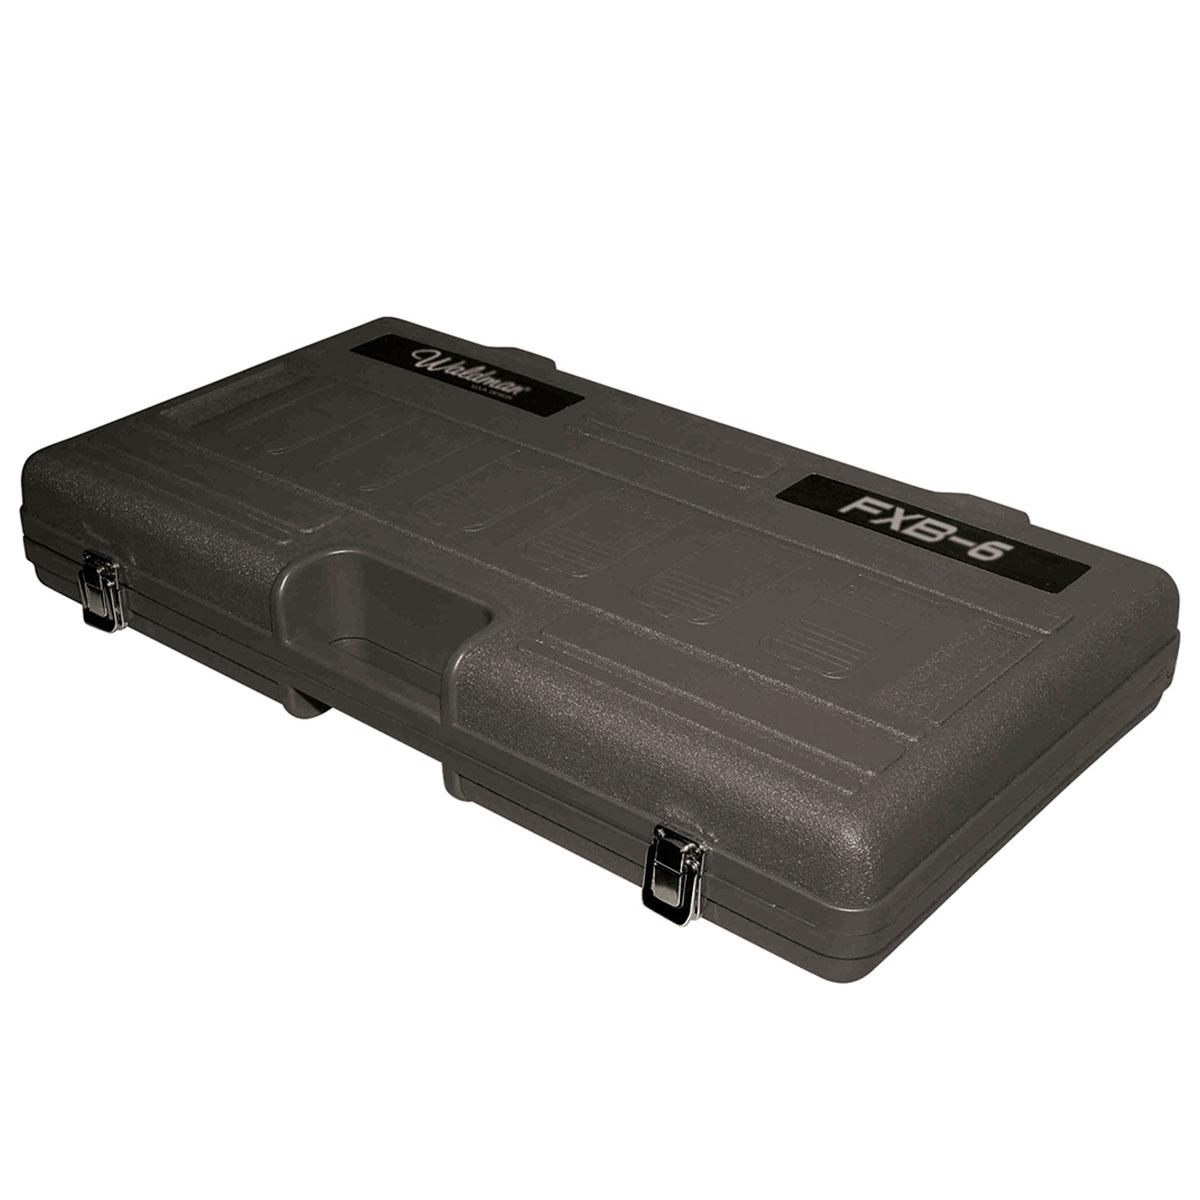 FXB6 - Case PedalBoard p/ Até 6 Pedais FXB 6 - Waldman